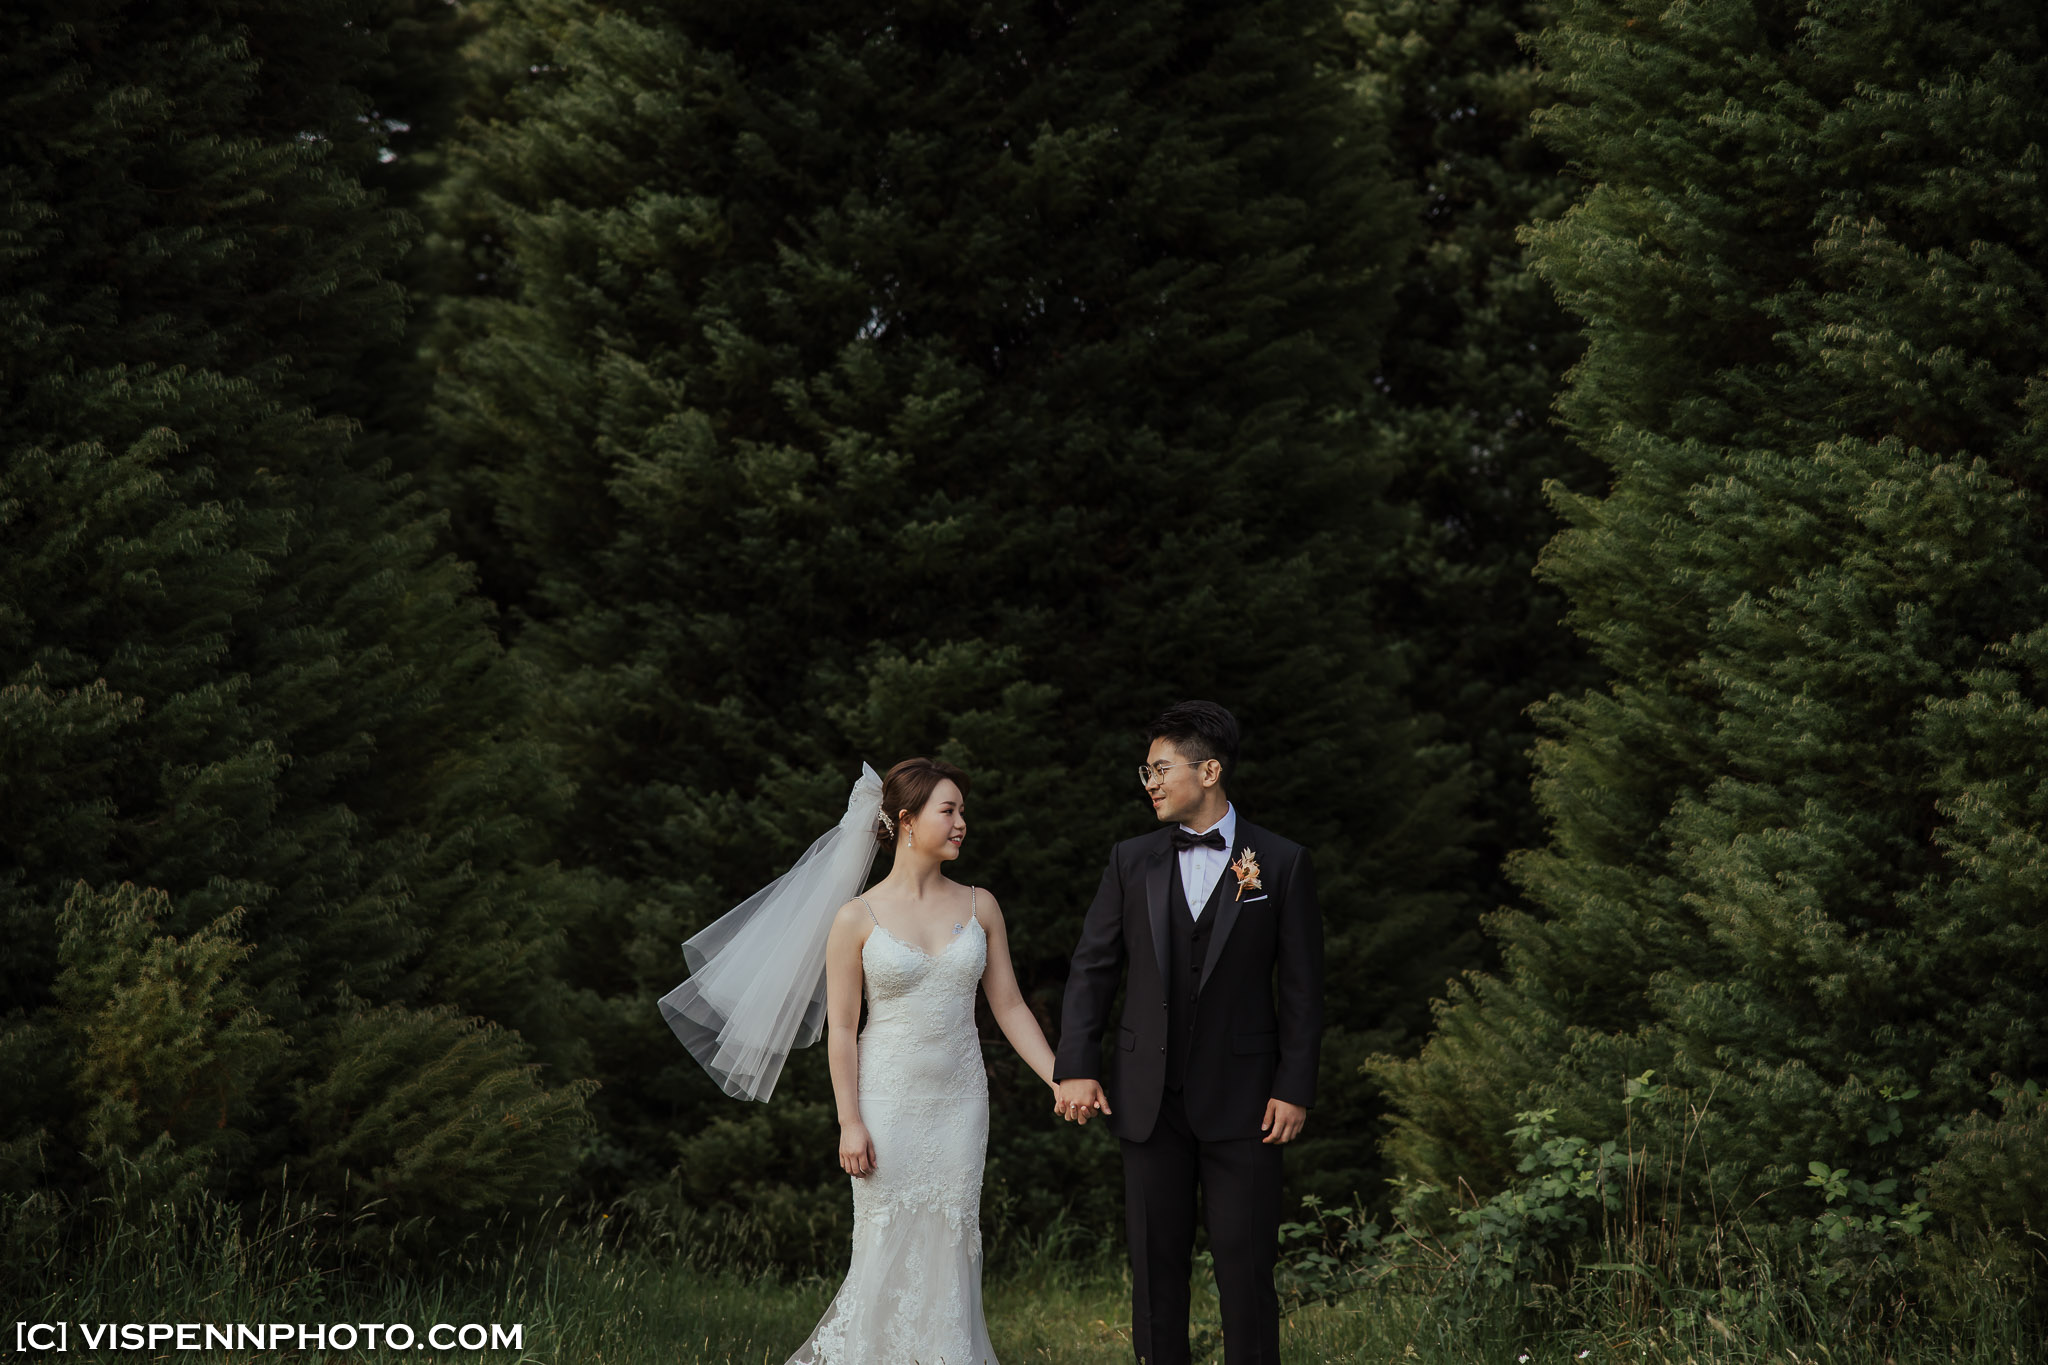 WEDDING DAY Photography Melbourne ElitaPB 06674 1P EOSR ZHPENN